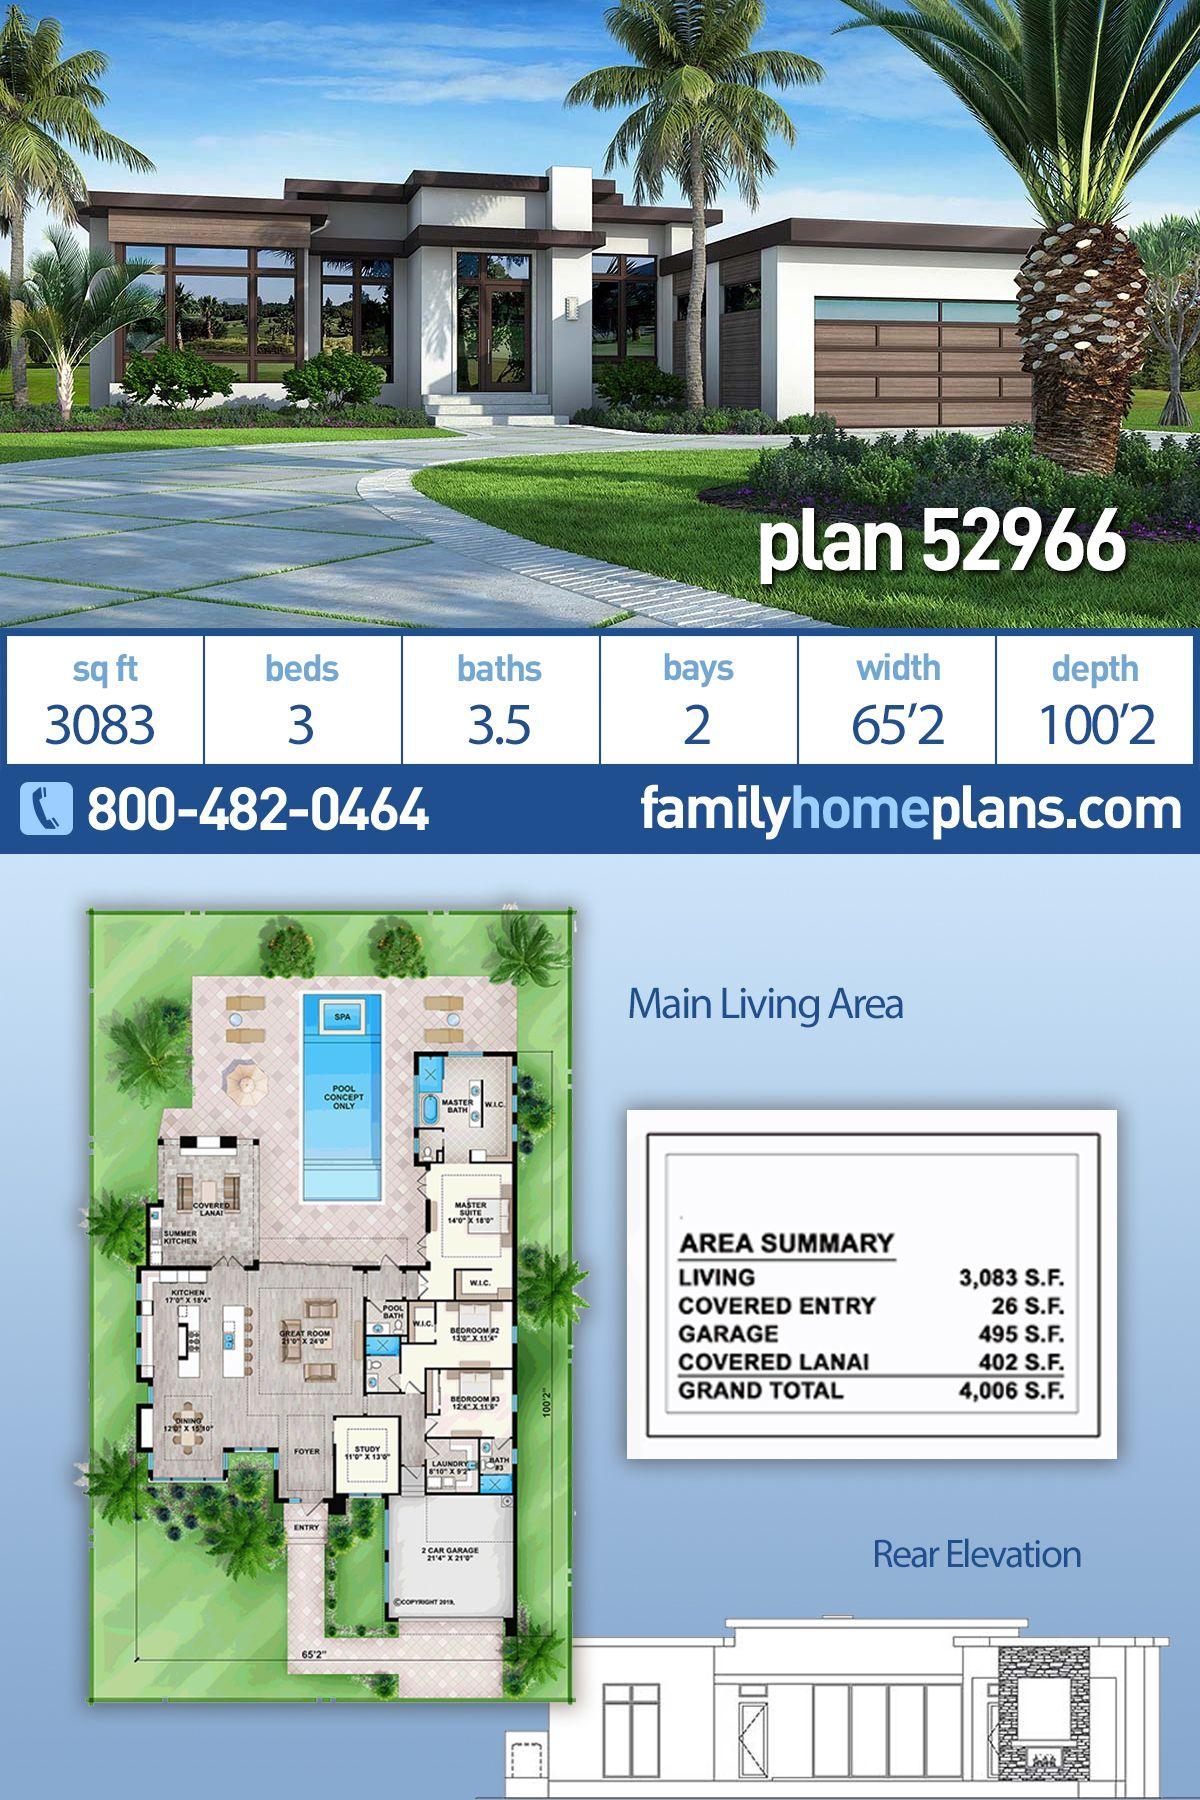 Contemporary Florida Modern Southwest House Plan 52966 With 3 Beds 4 Baths 2 Car Garage Contemporary House Plans Modern House Plans Beach House Plans